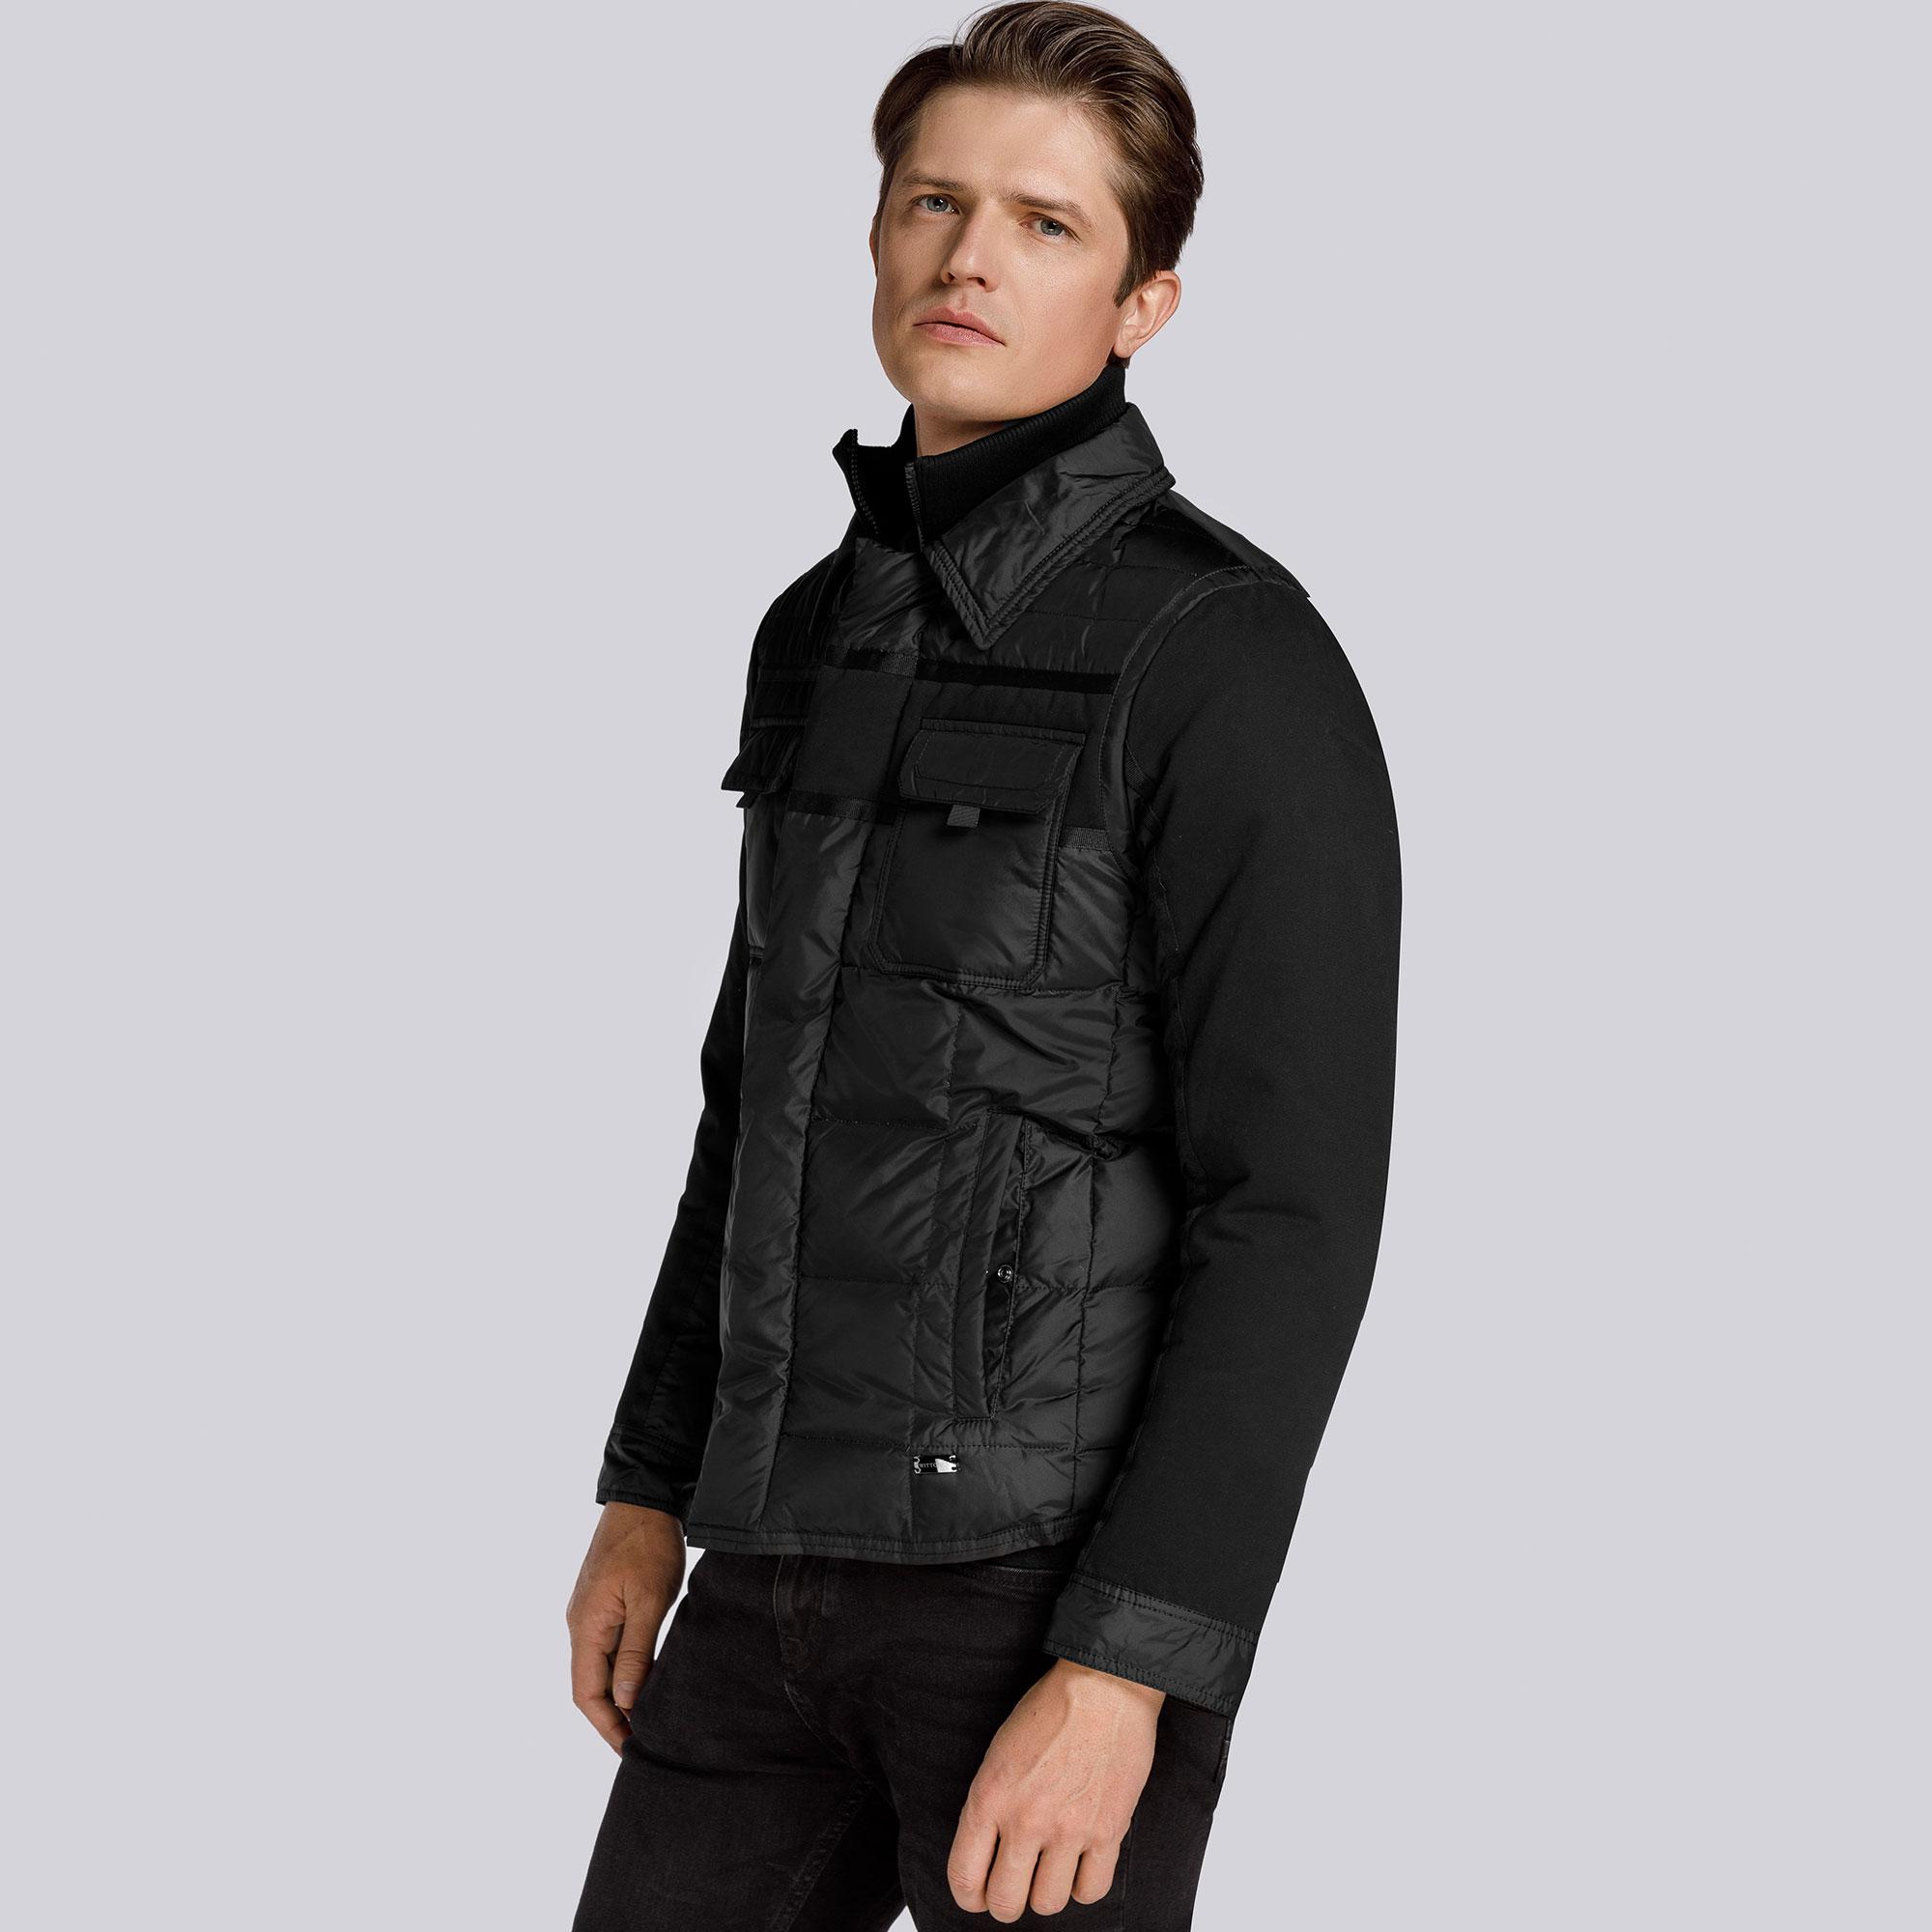 Куртка мужская Wittchen 85-9D-351-1, черныйКуртка мужская<br><br>секс: мужчина<br>Цвет: черный<br>Размер INT: M<br>материал:: Полиэстер